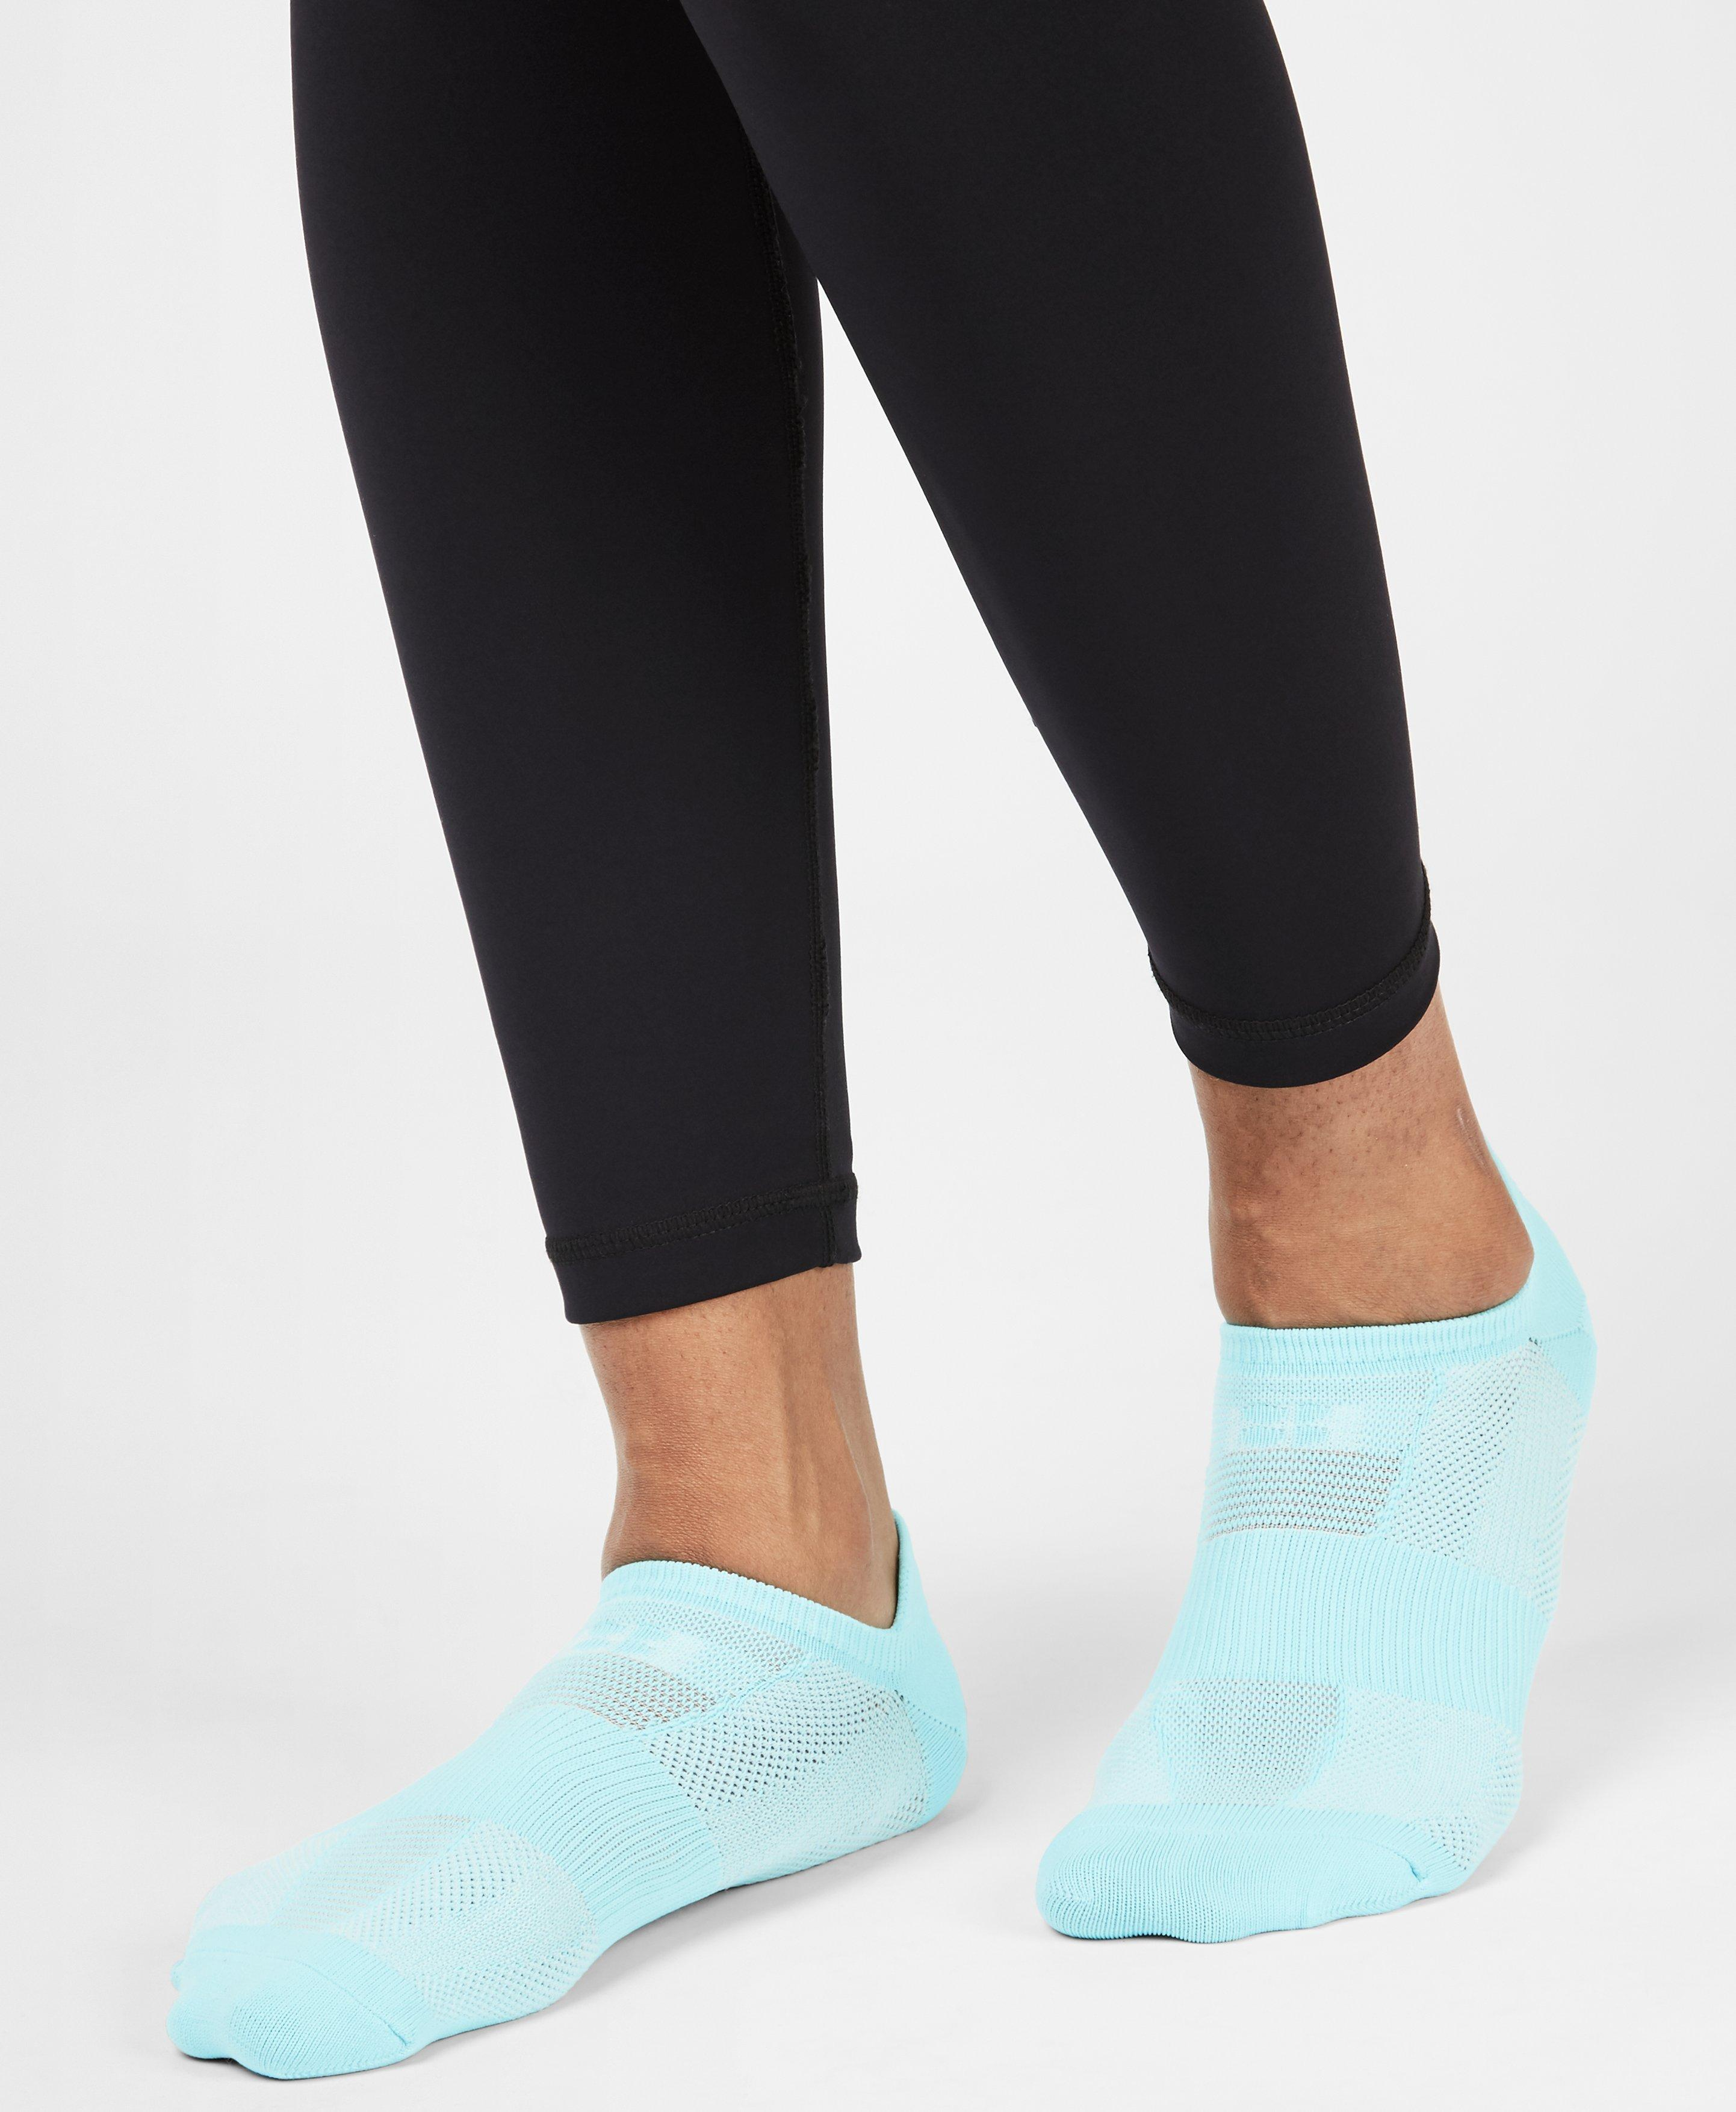 Lightweight Workout Trainer Socks